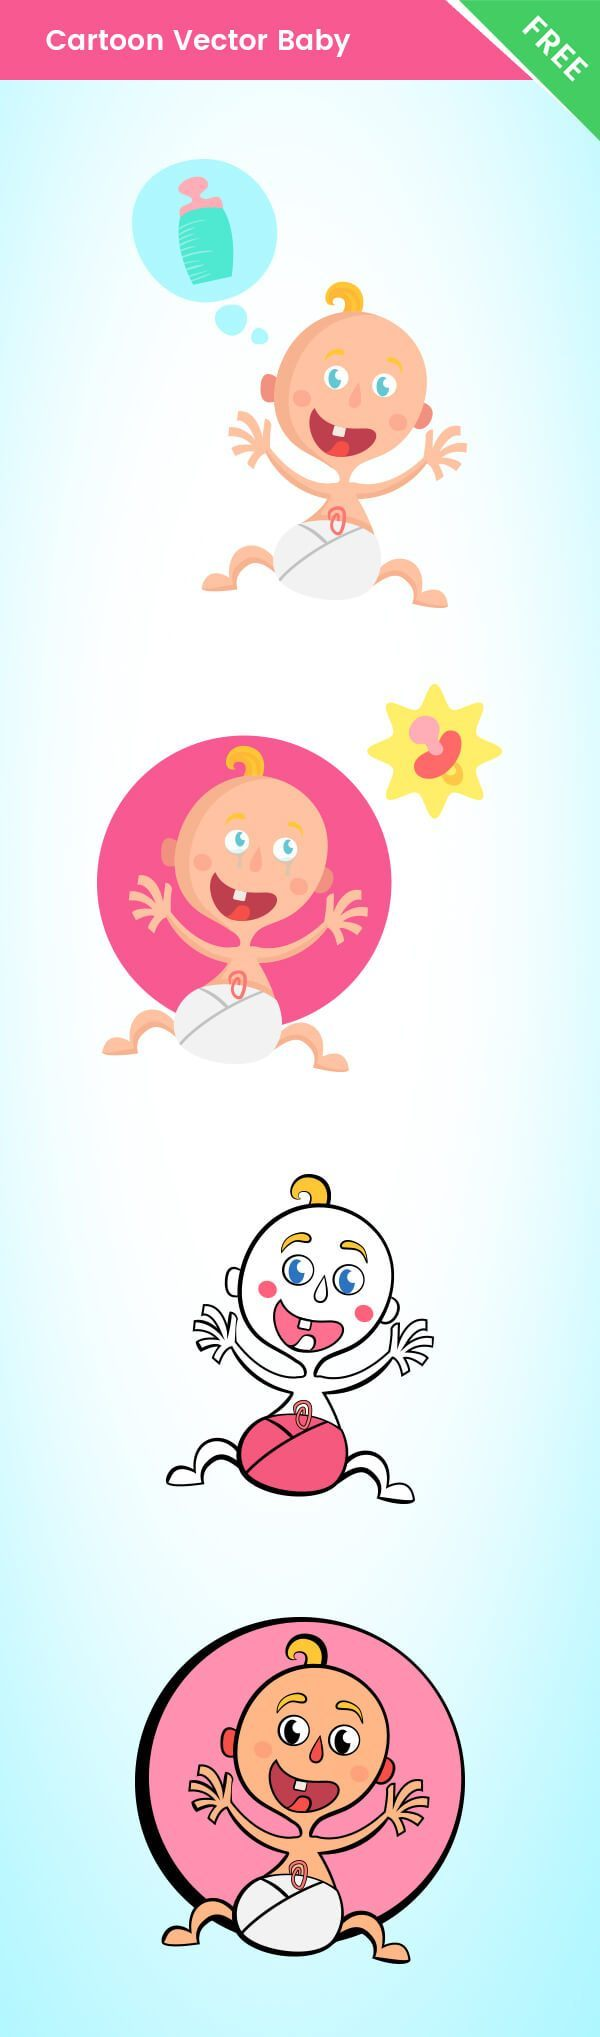 Free Vector Baby Cartoon Characters